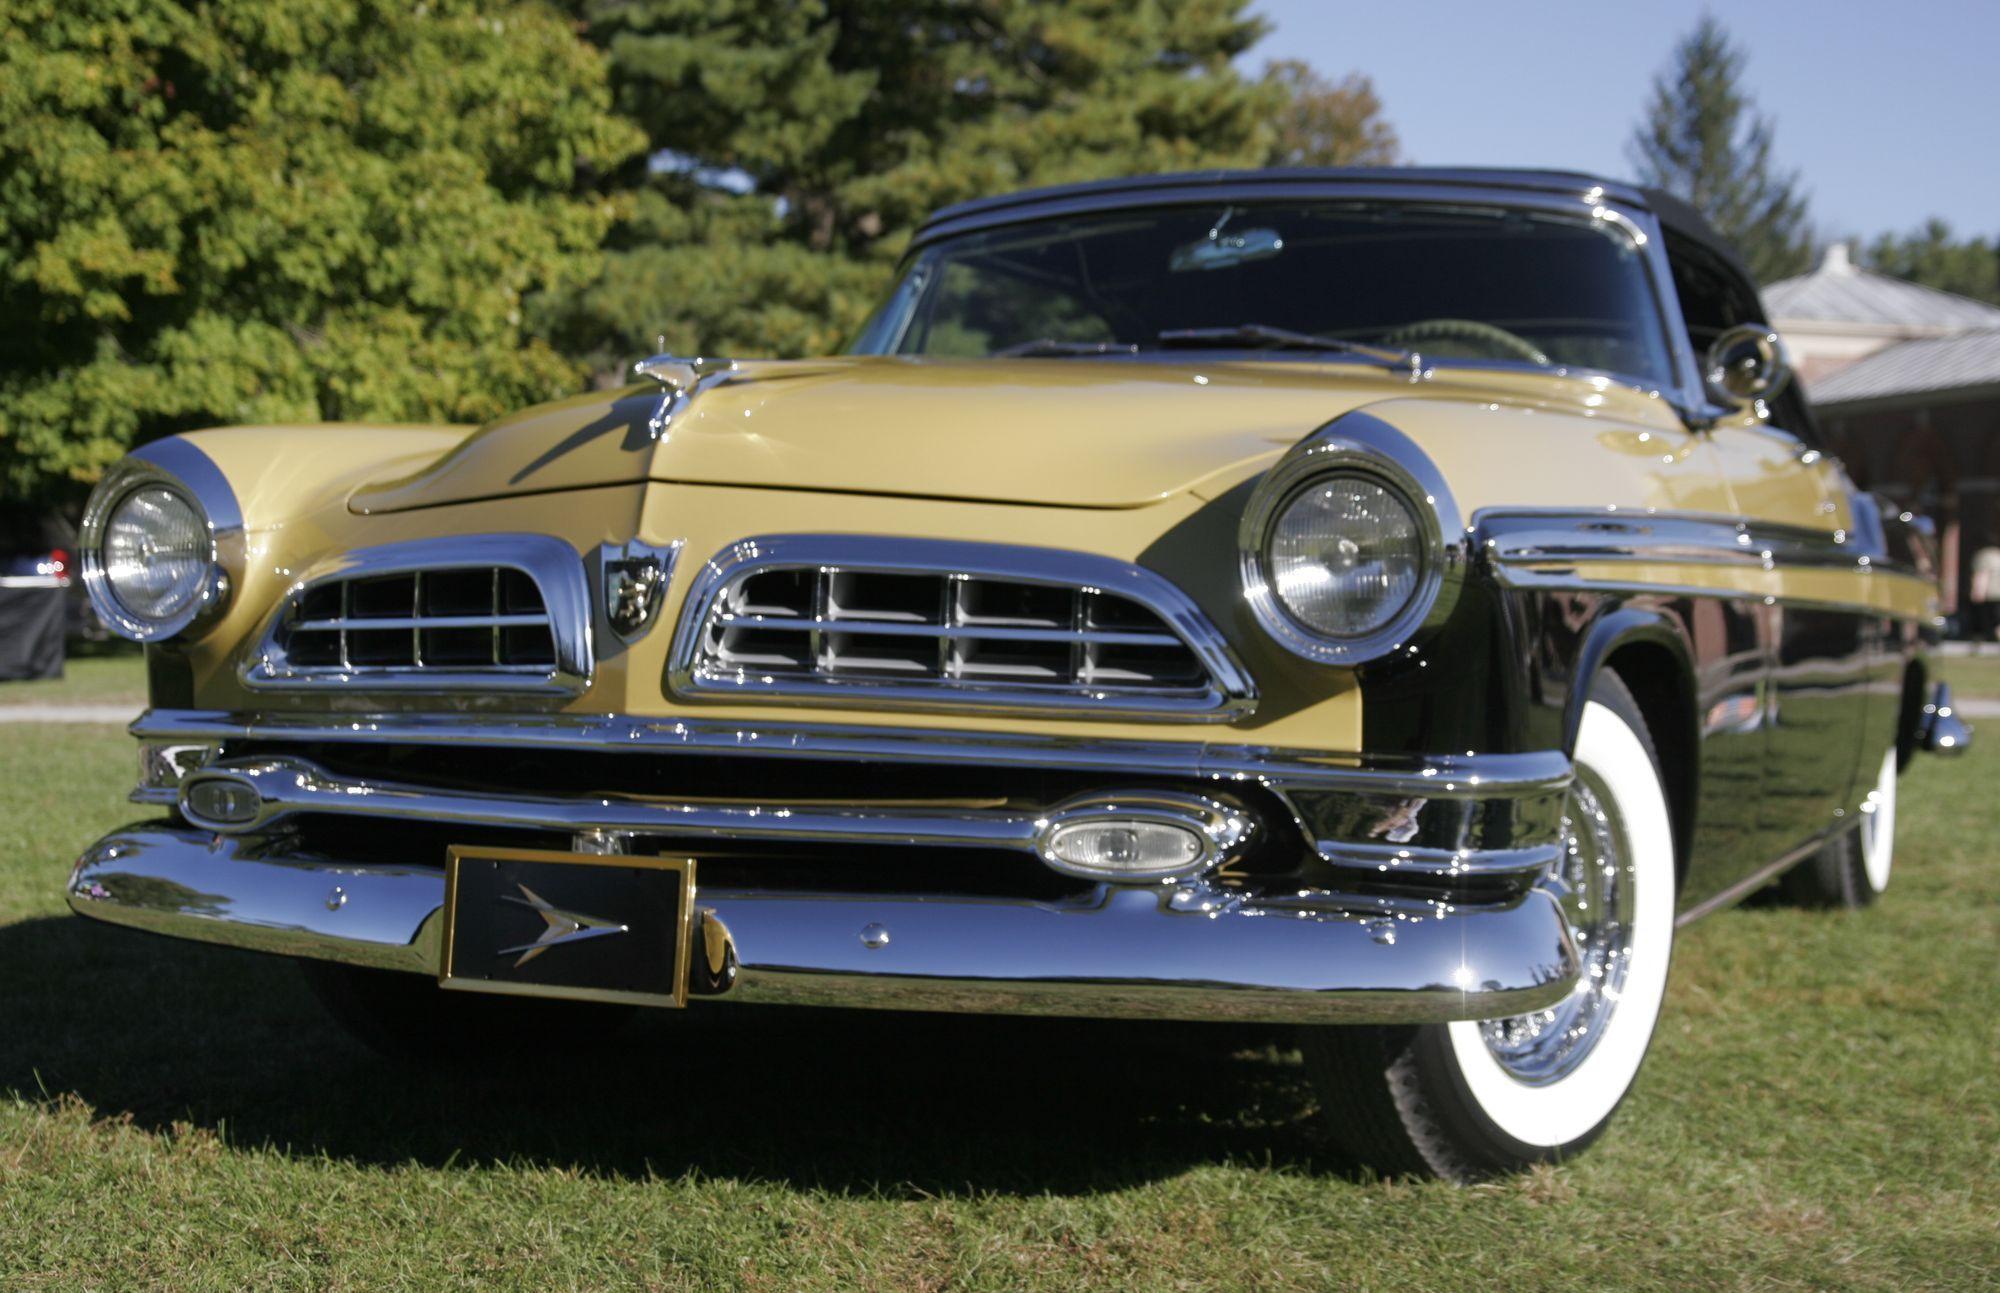 1956 chrysler imperial interior images - 1956 Chrysler Imperial Interior Images 38